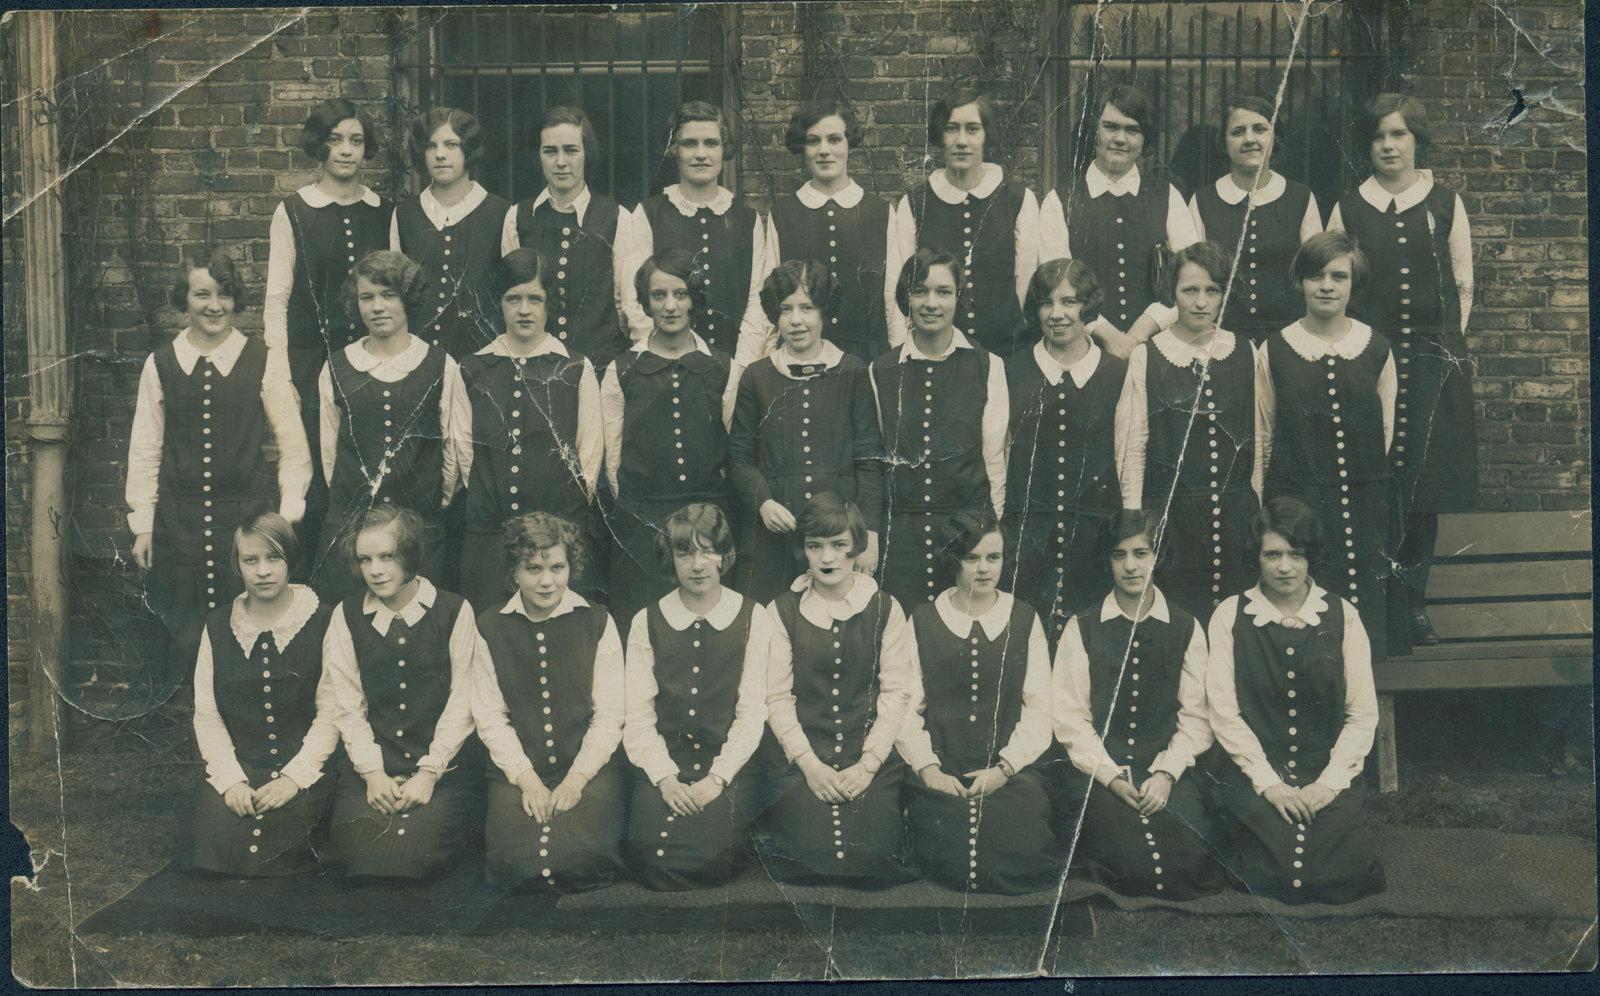 Wilmette girls